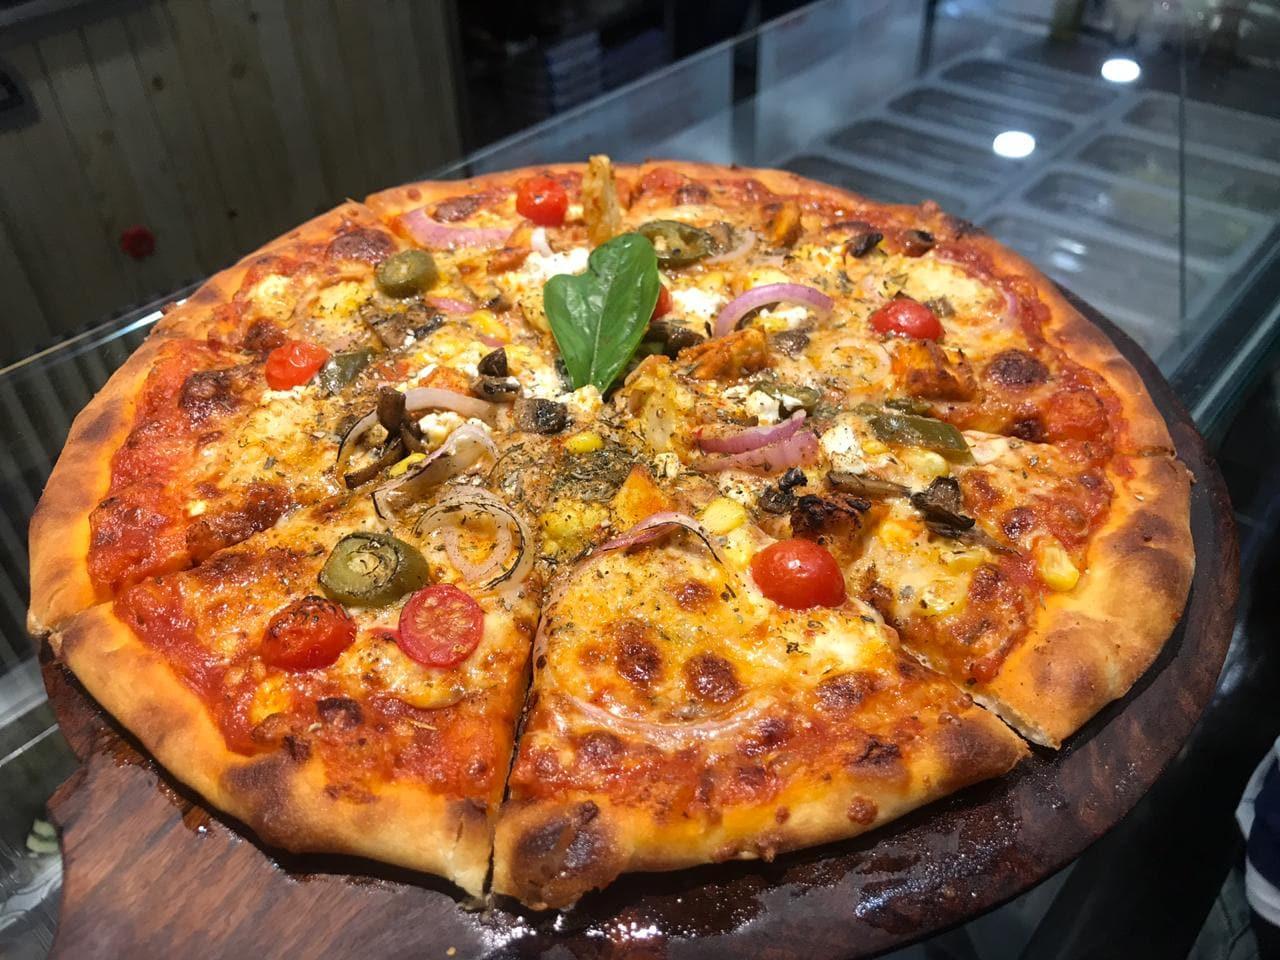 Best Pizza in Caulfield | Flames Pizzeria